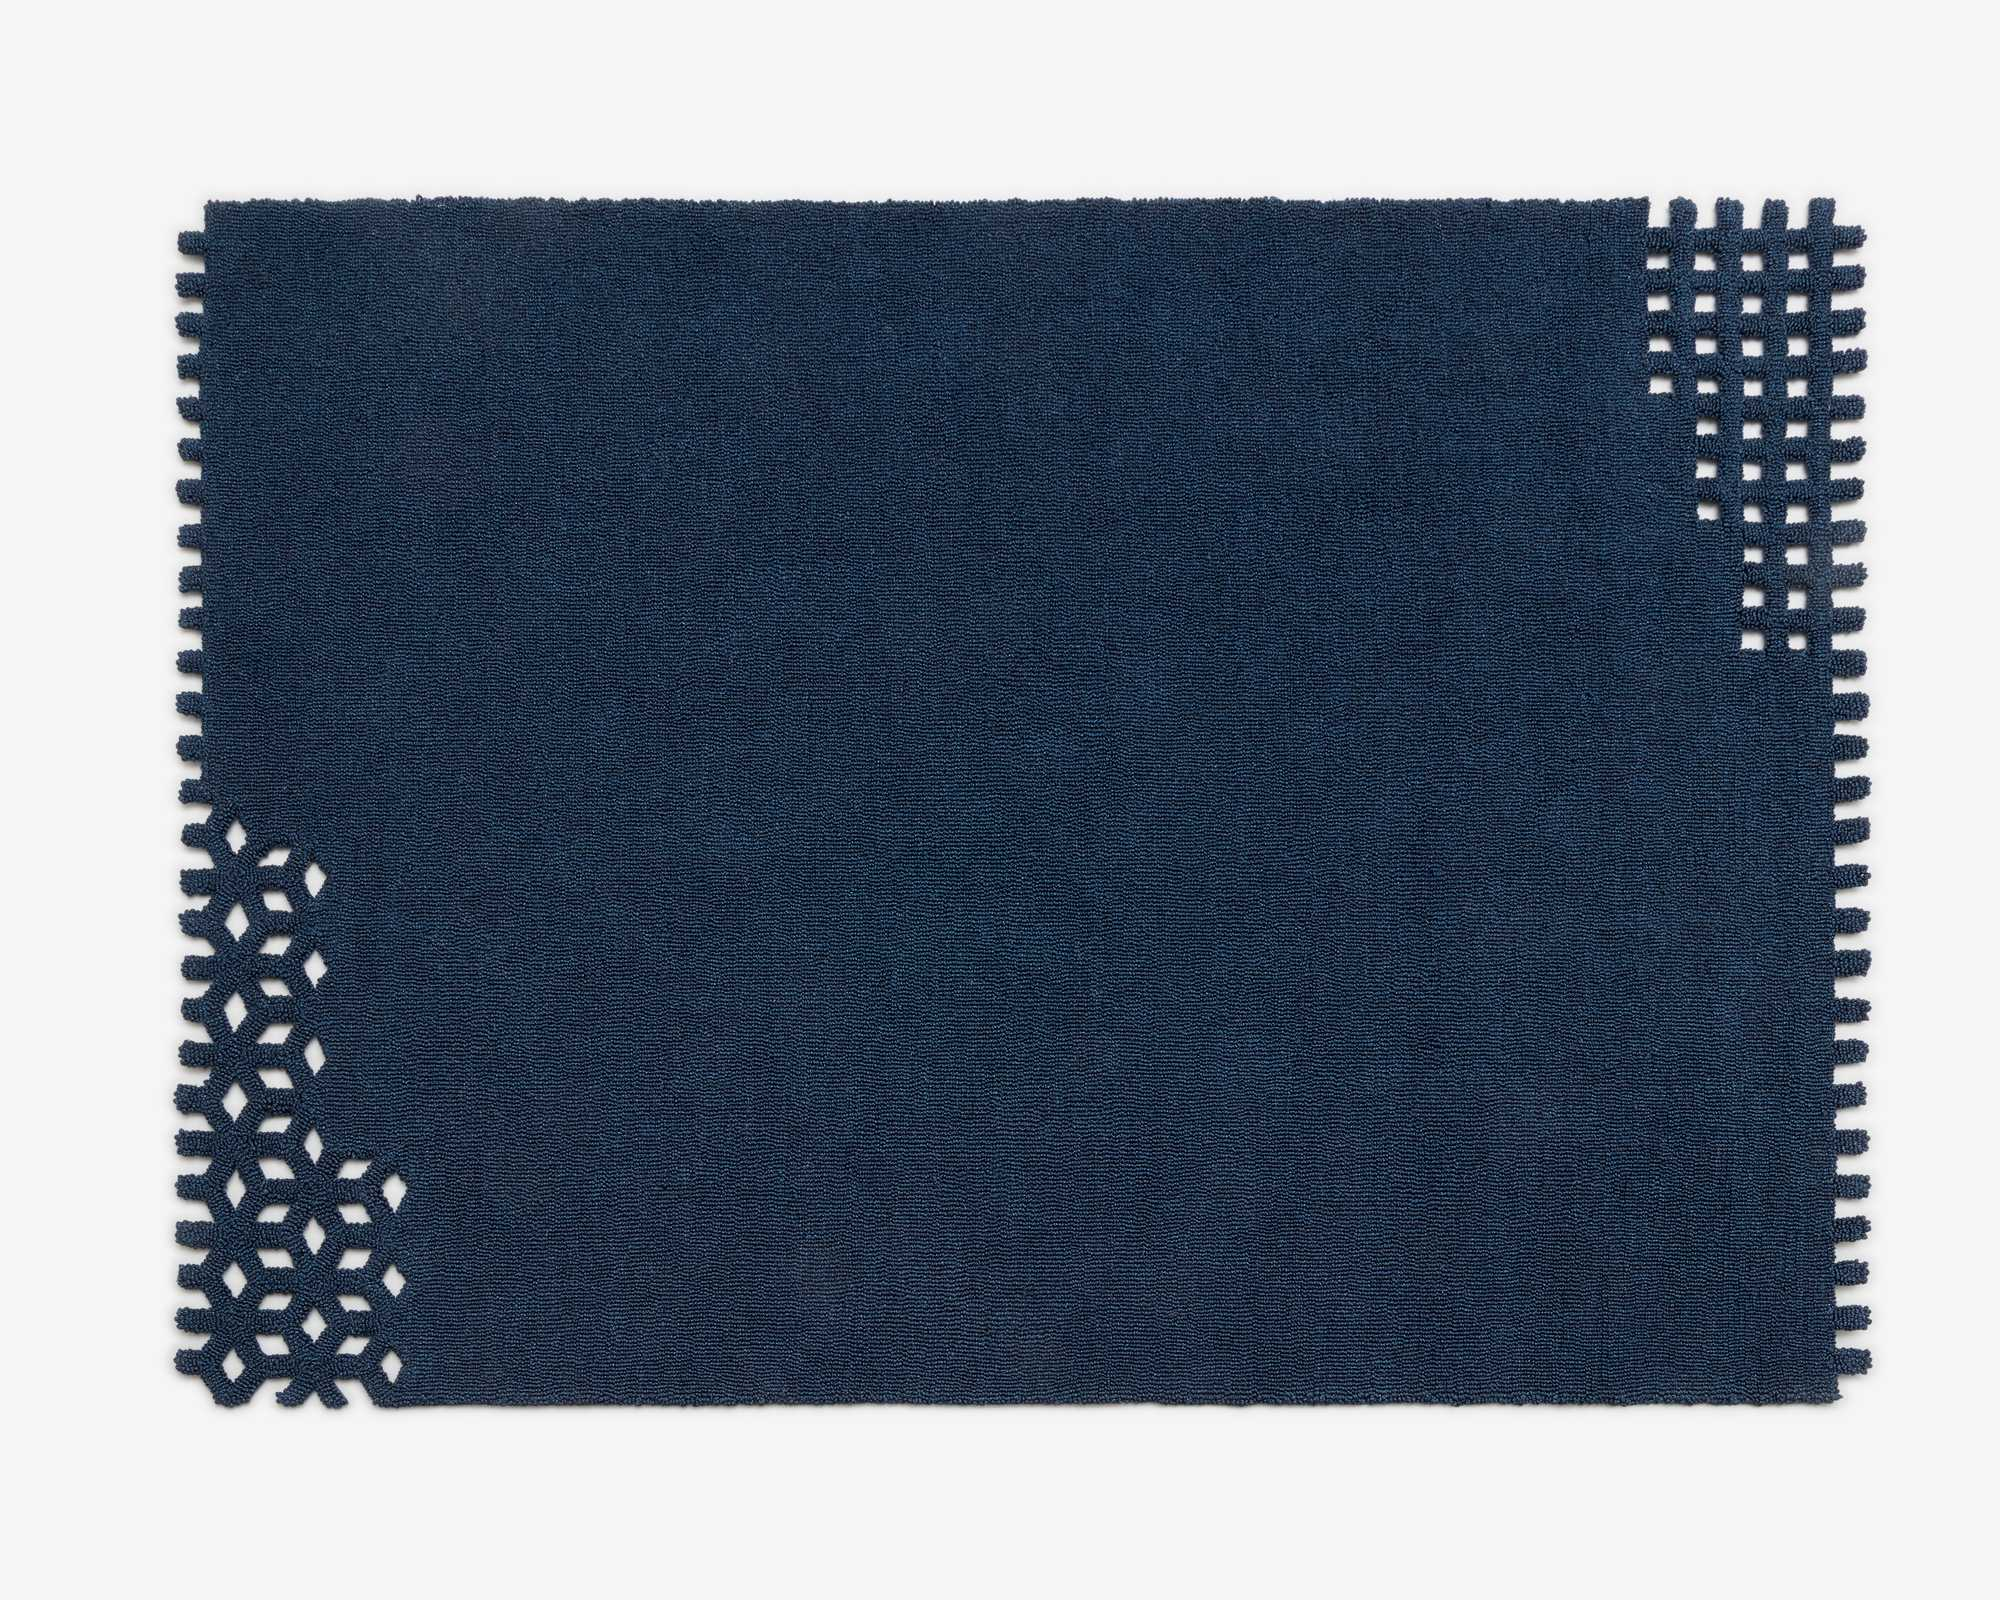 CROSS BORDER C0780 full size rug copy